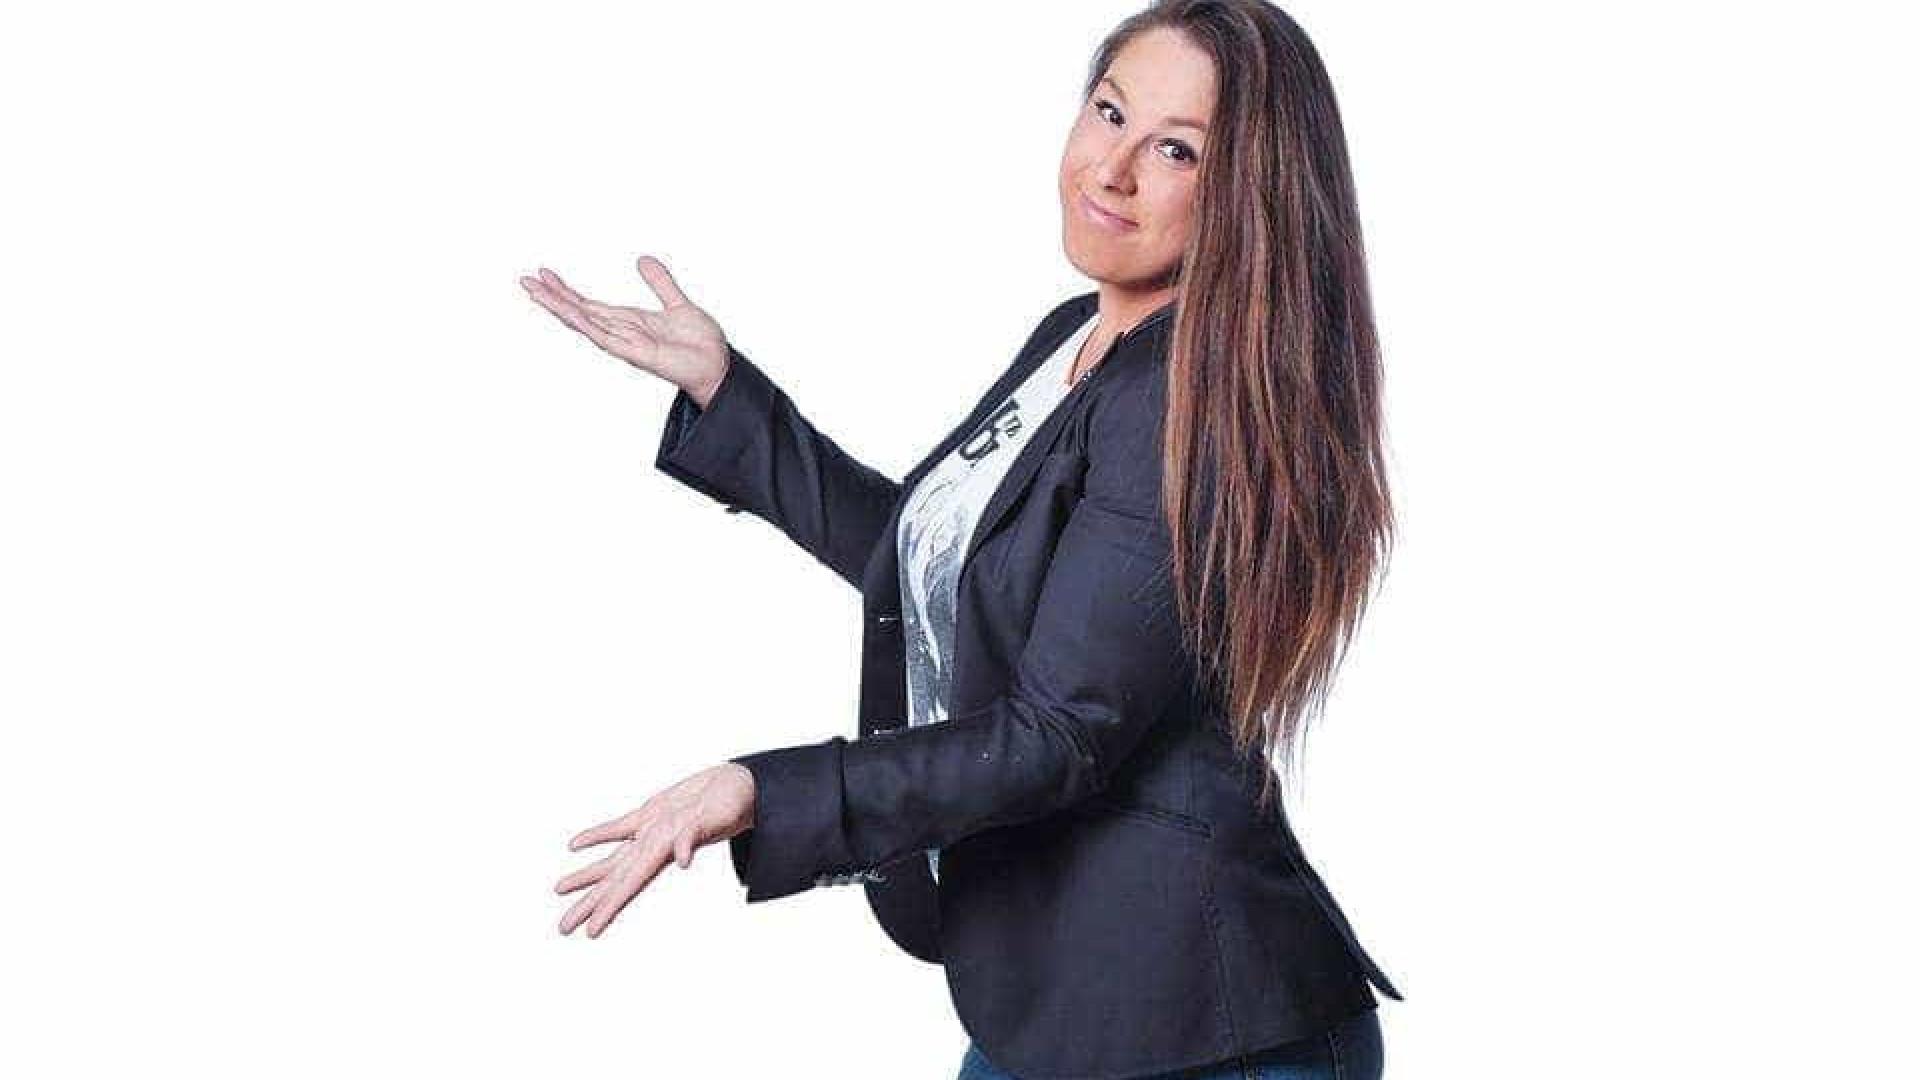 Após cirurgia, Joana Machado Madeira exibe curvas nas redes sociais